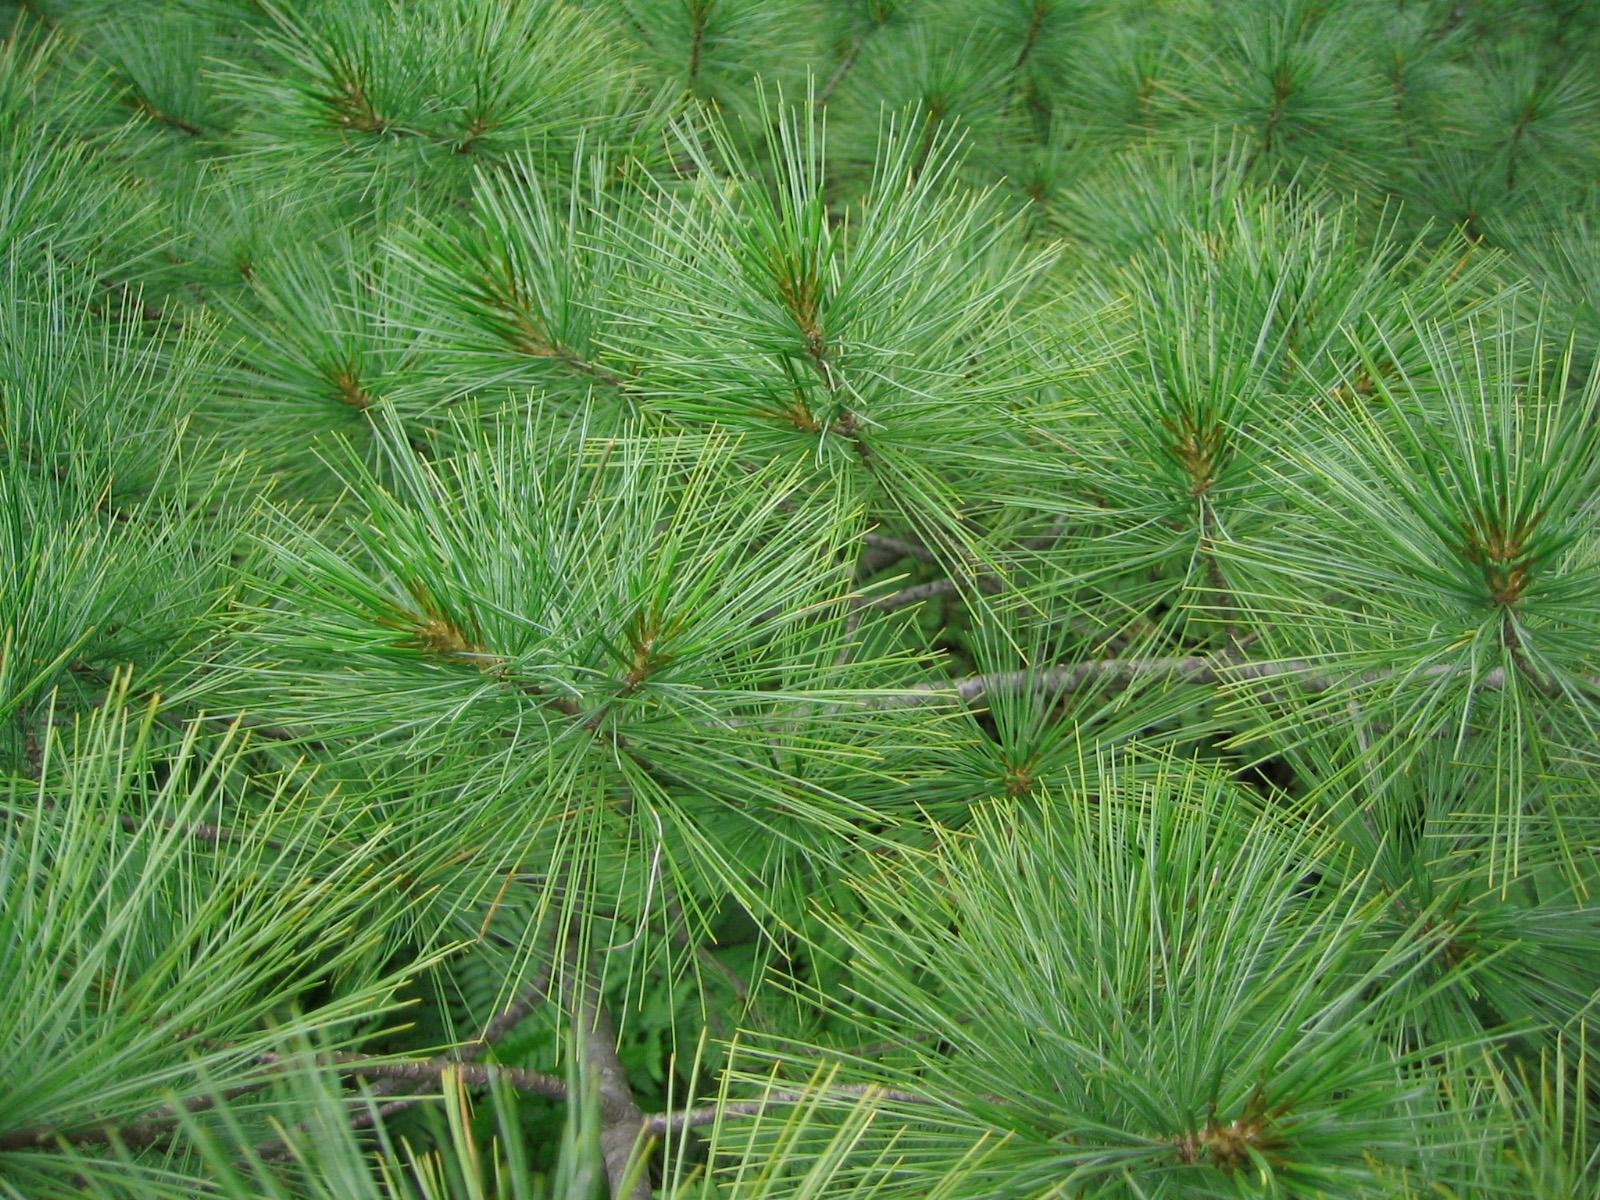 Allegan Conservation District Tree Sale Van Kal Permaculture